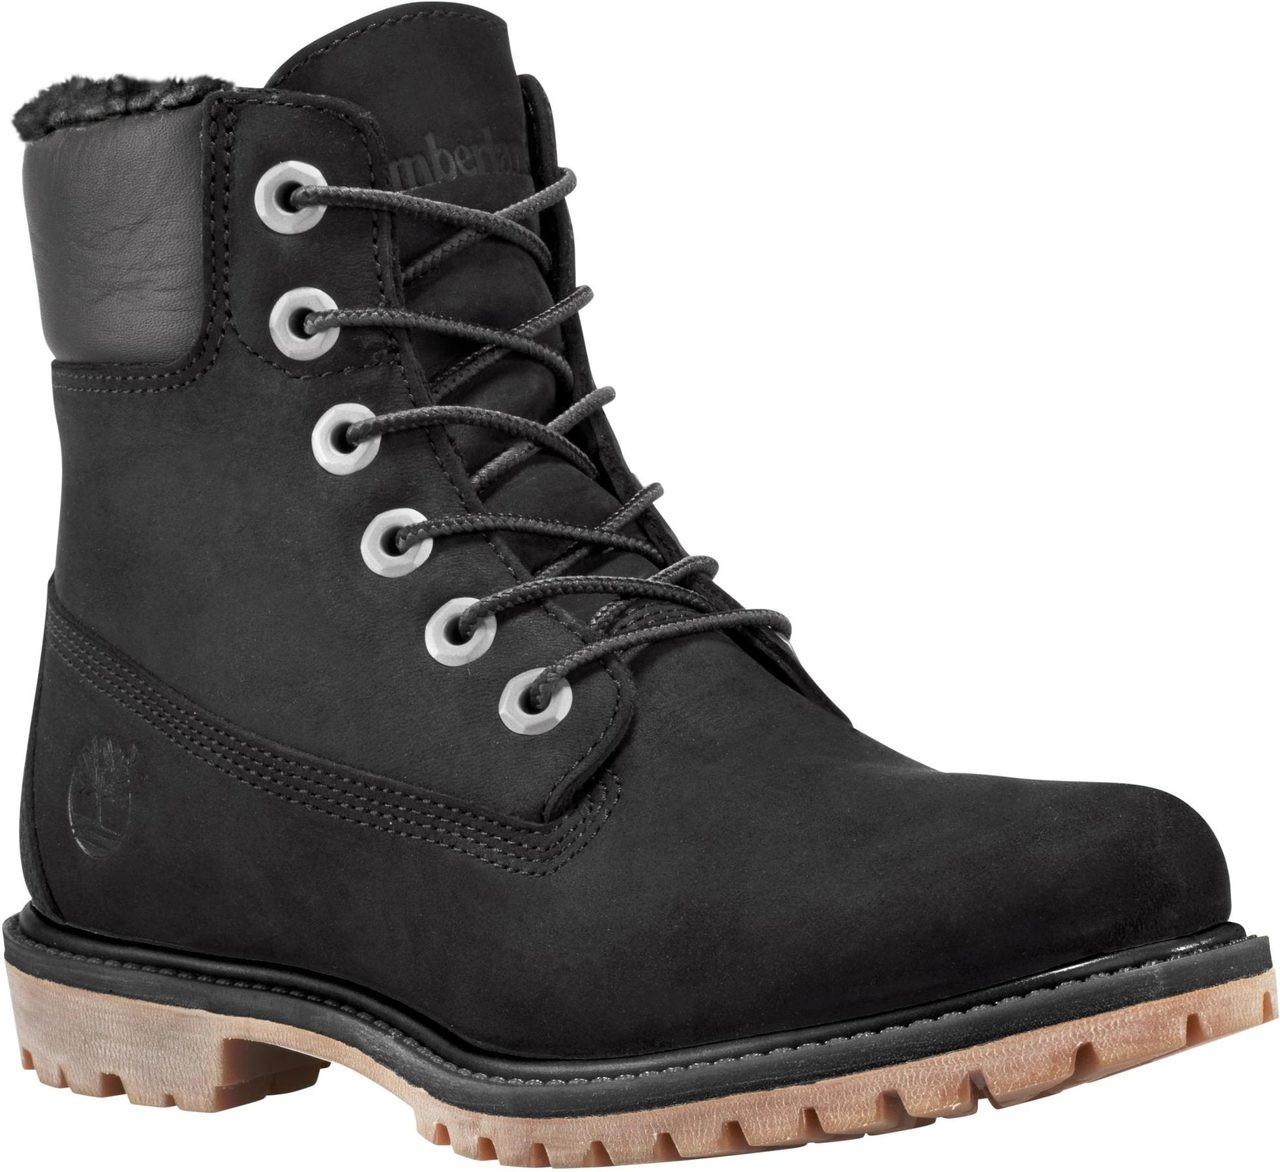 Boots Timberland Womens 6Inch Premium FleeceLined Black Nubuck